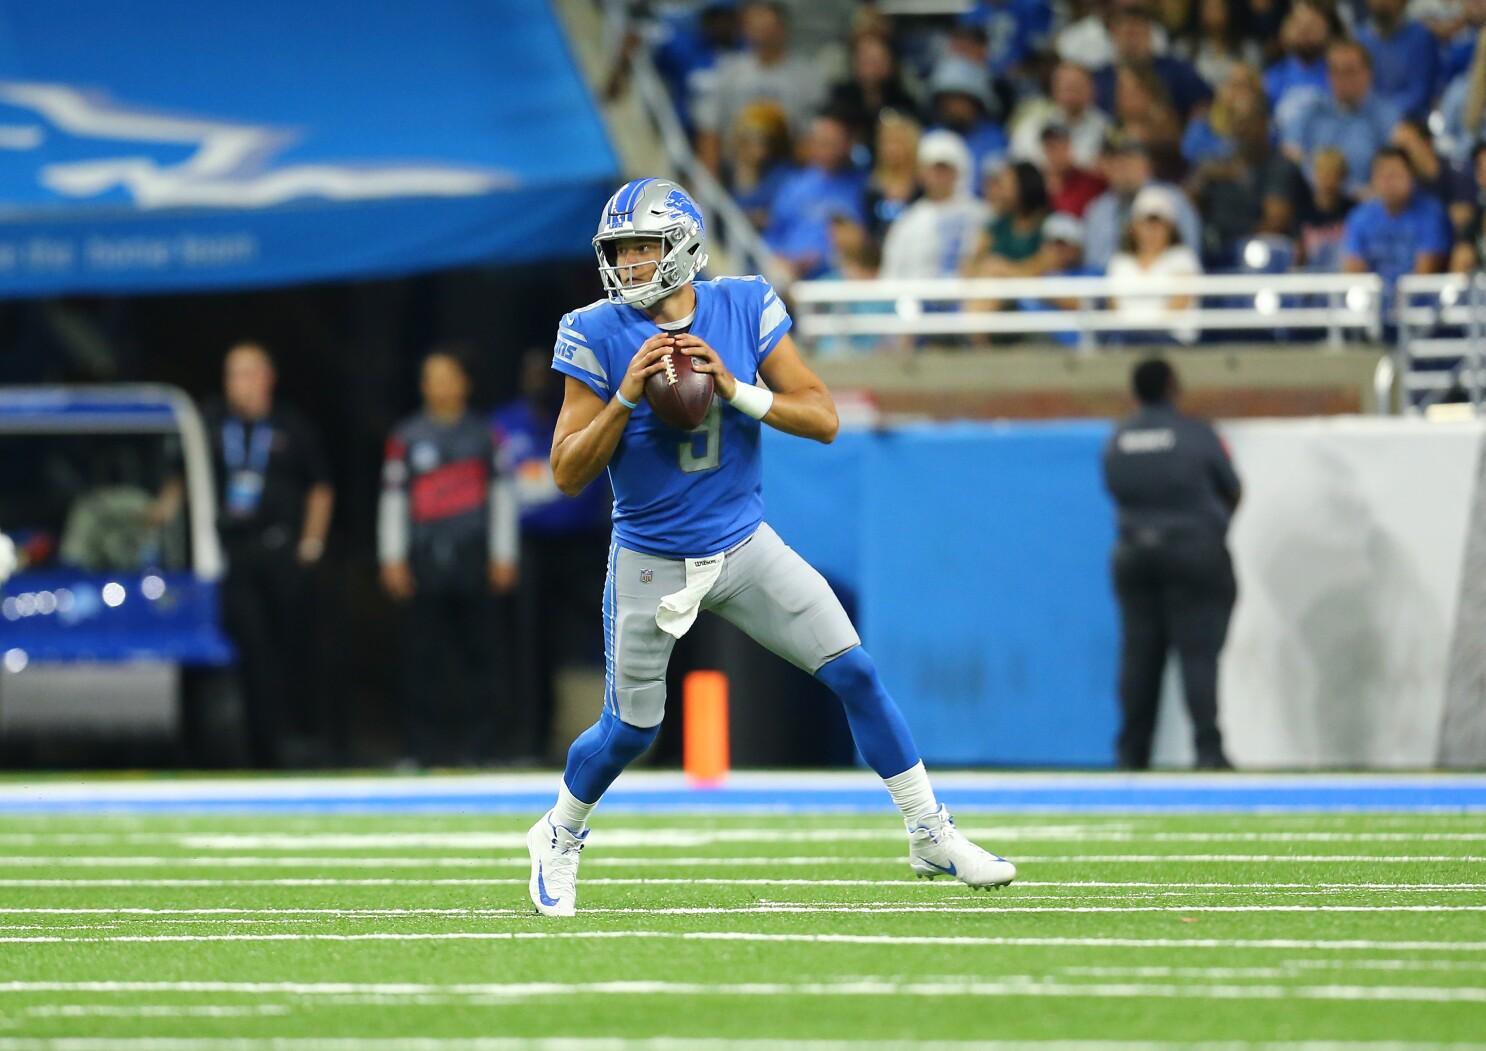 NFL preseason: Bills rally past Lions as both teams suffer injuries to key players; Buccaneers edge Browns